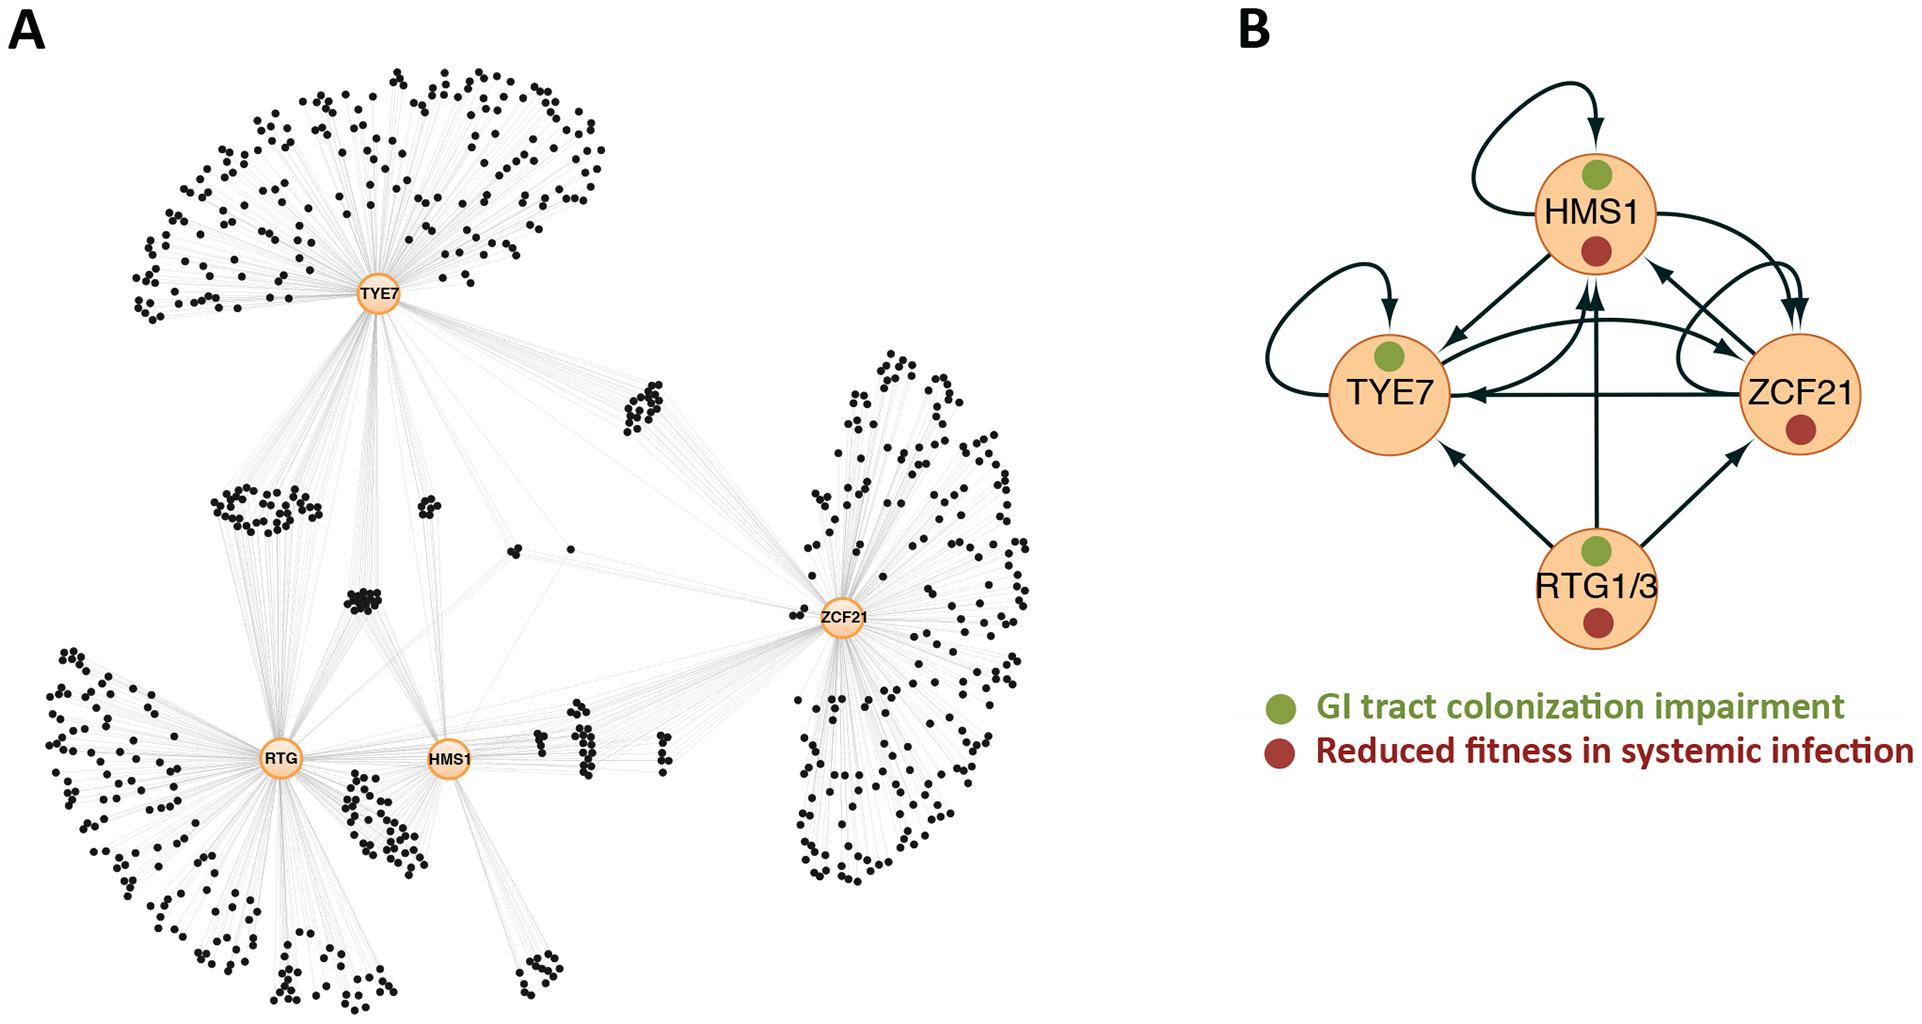 Gene regulatory network directing <i>C. albicans</i> proliferation in a mammalian host.